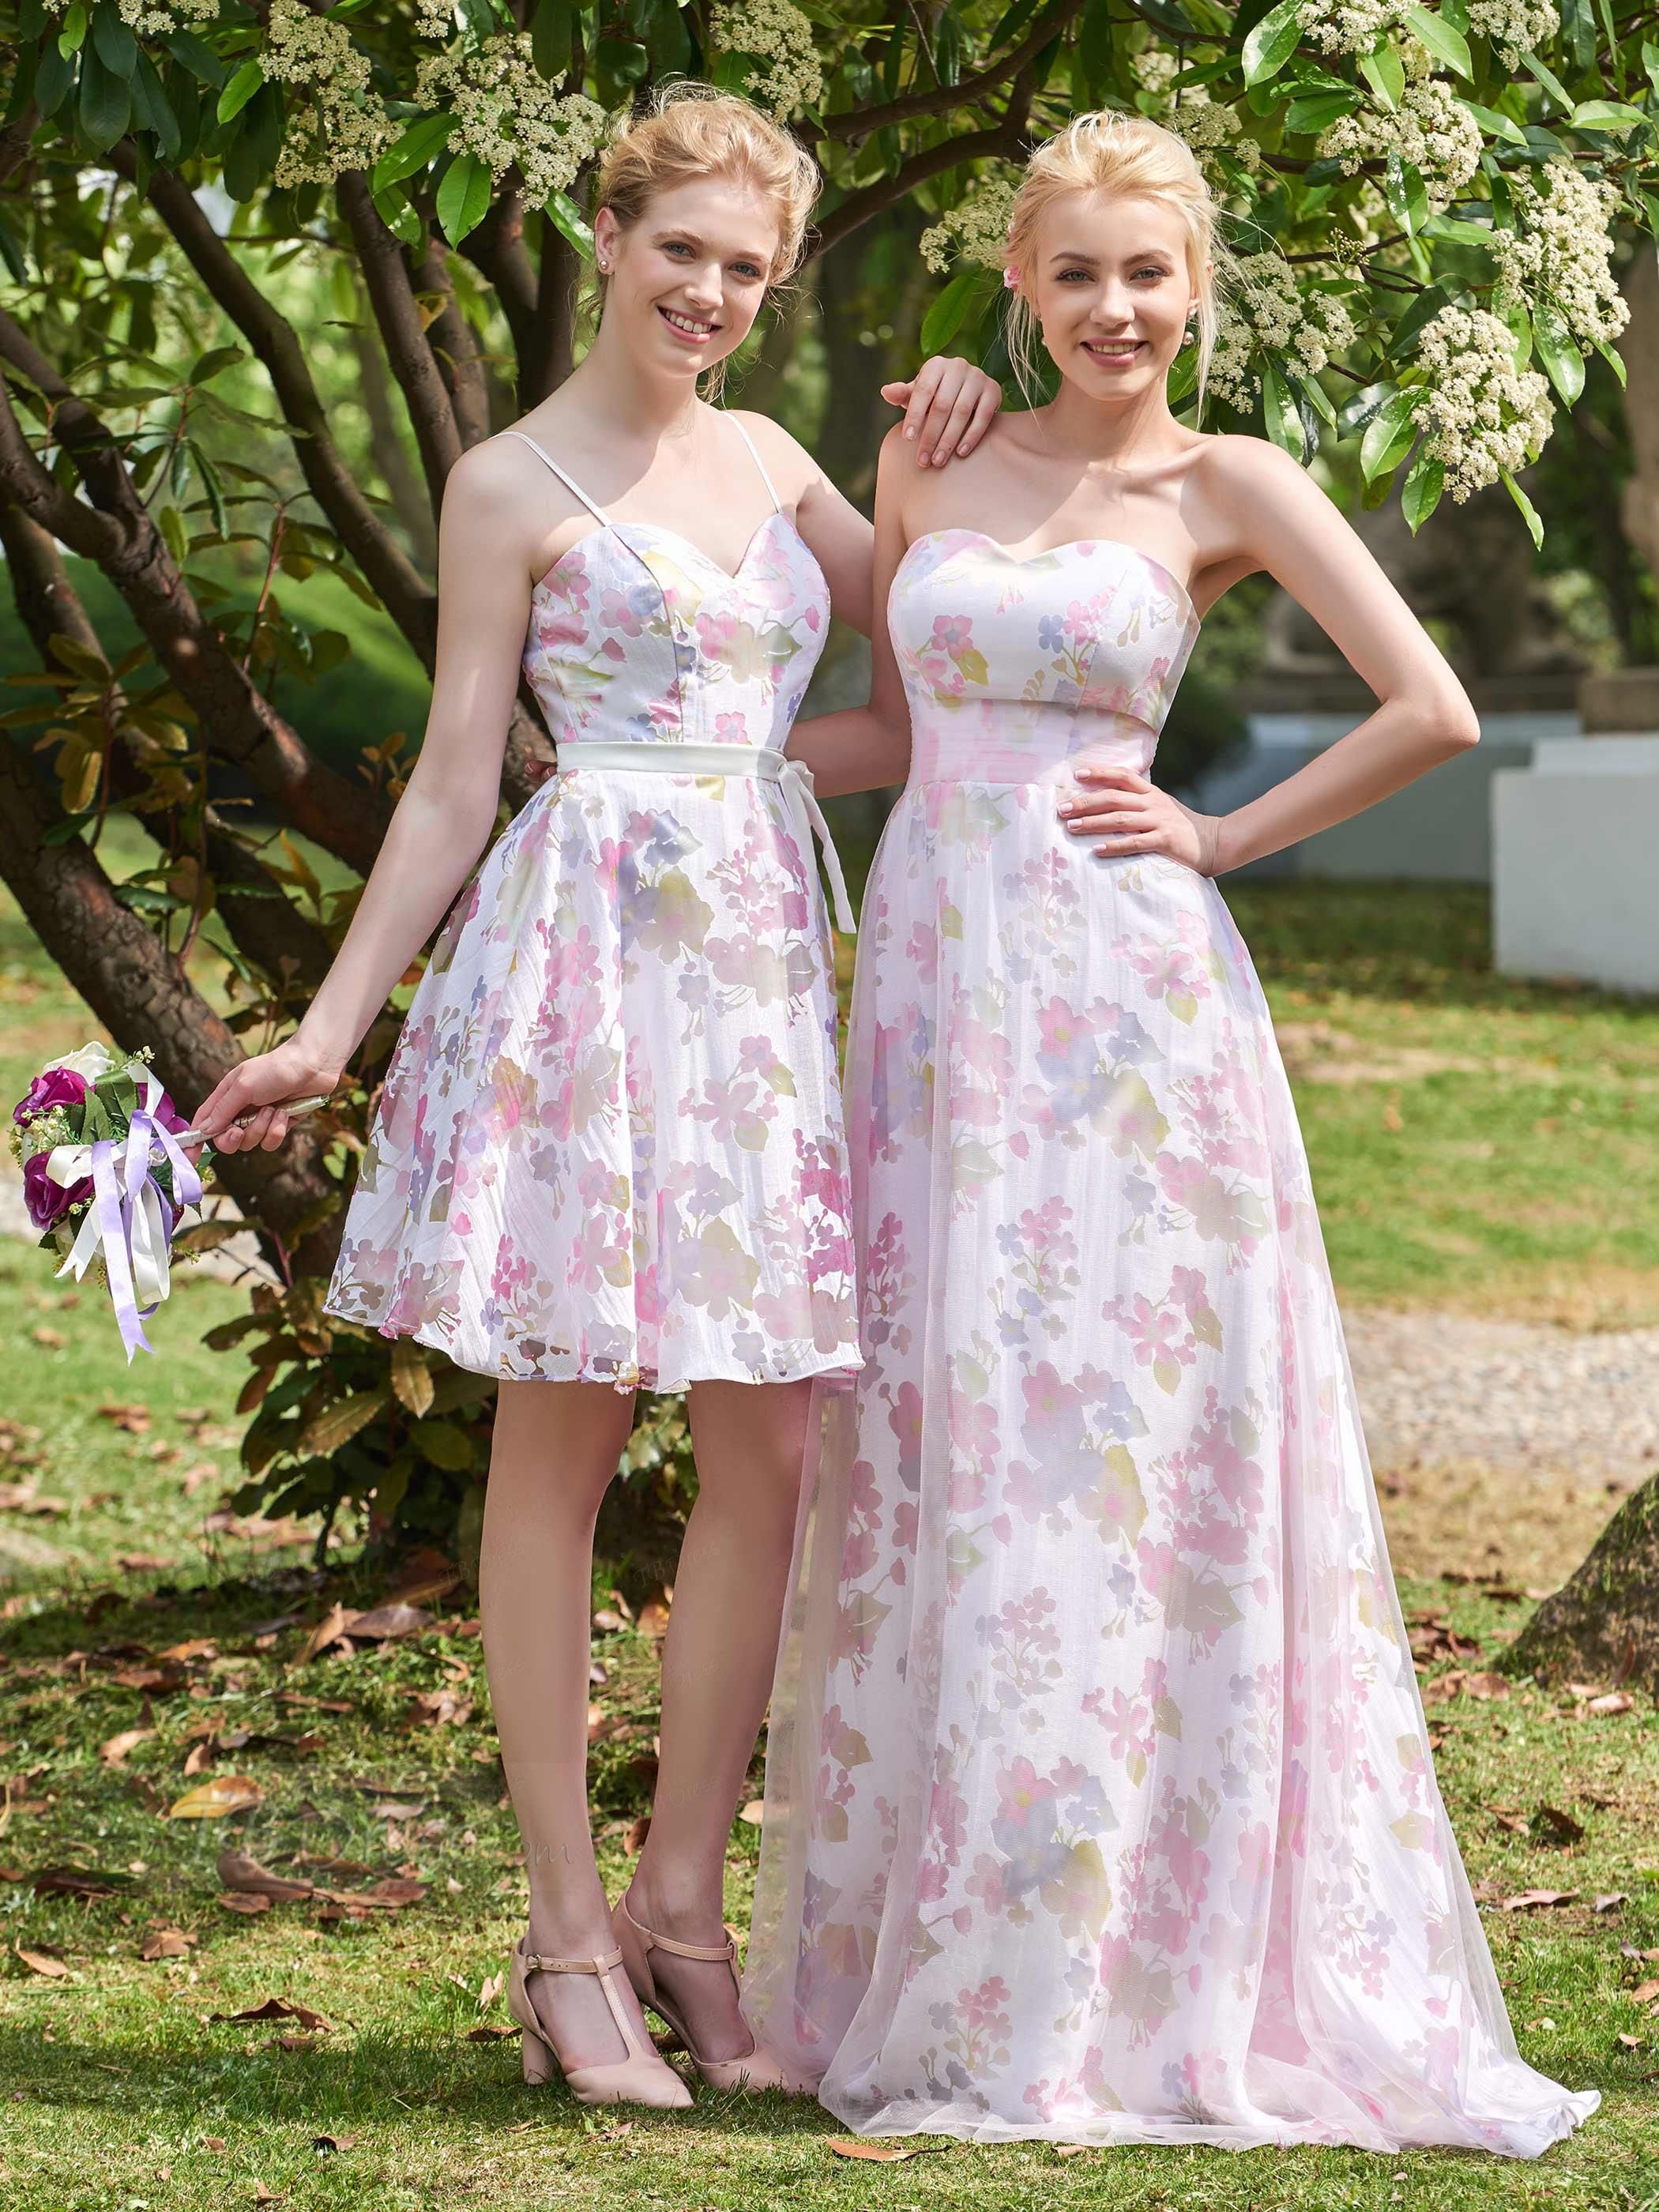 Bridesmaid Dresses Uk Wedding Party Parties Bridesmaids Sleeveless Color Print Zipper Printing Weddings